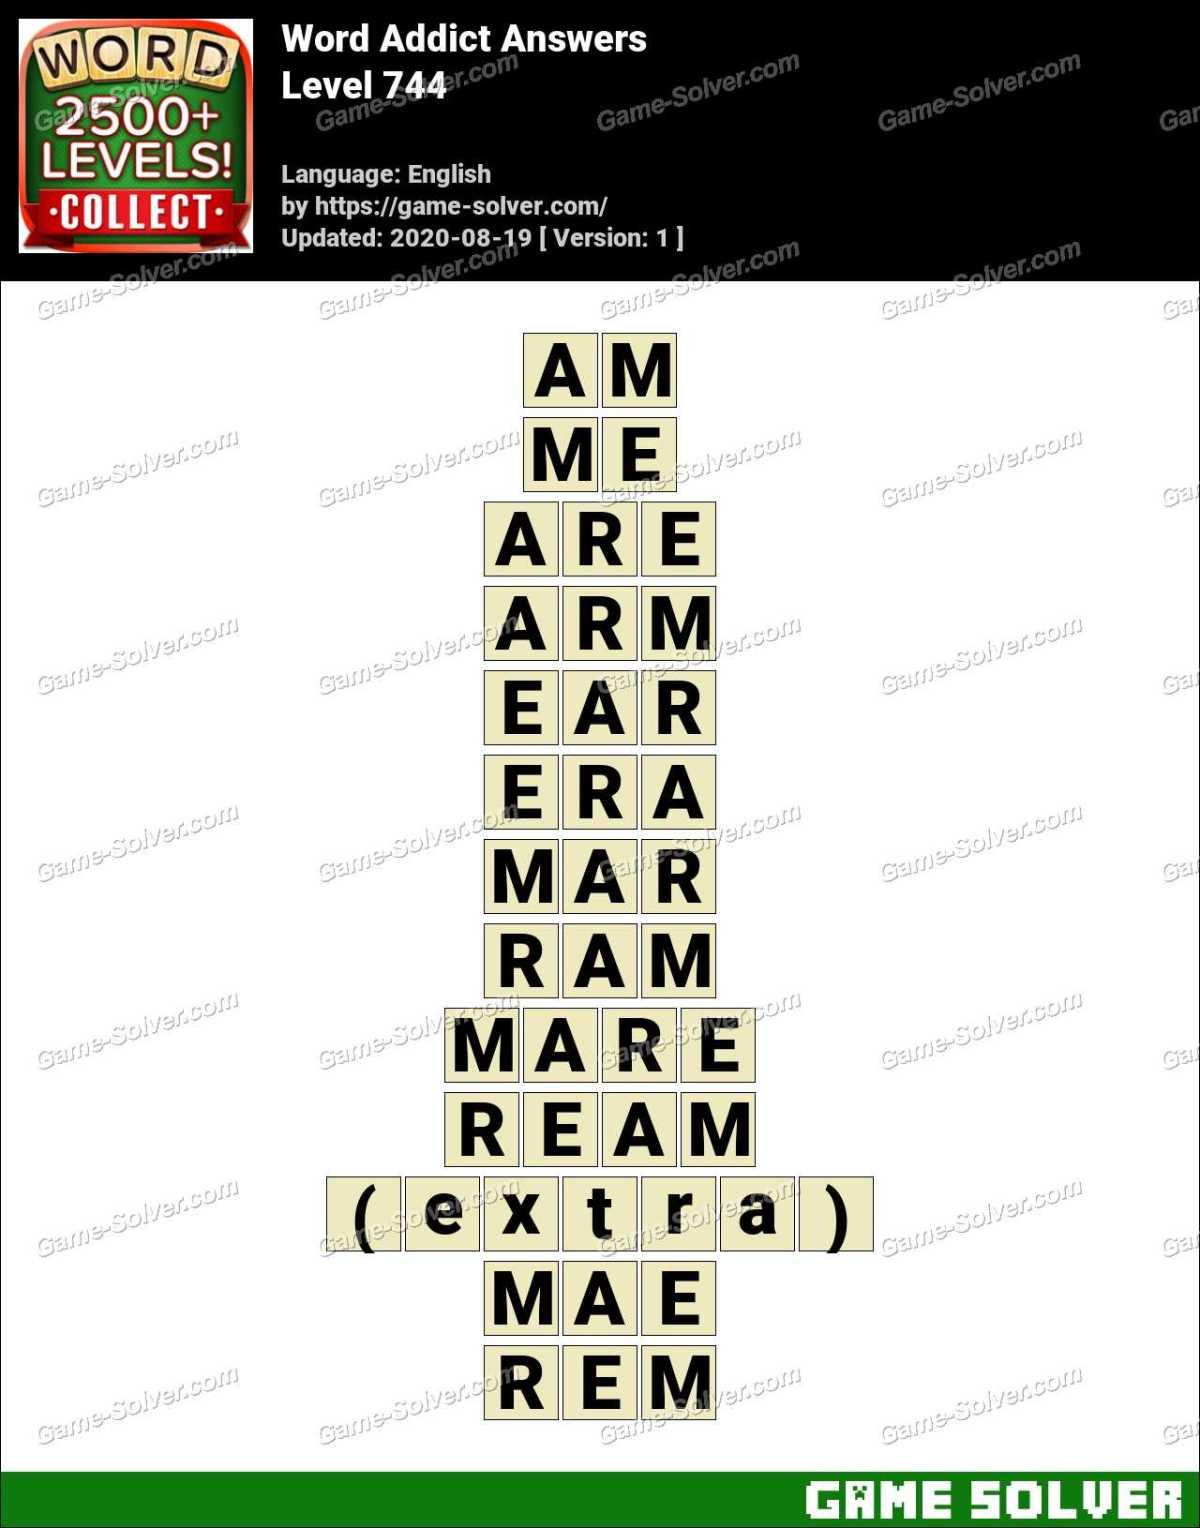 Word Addict Level 744 Answers